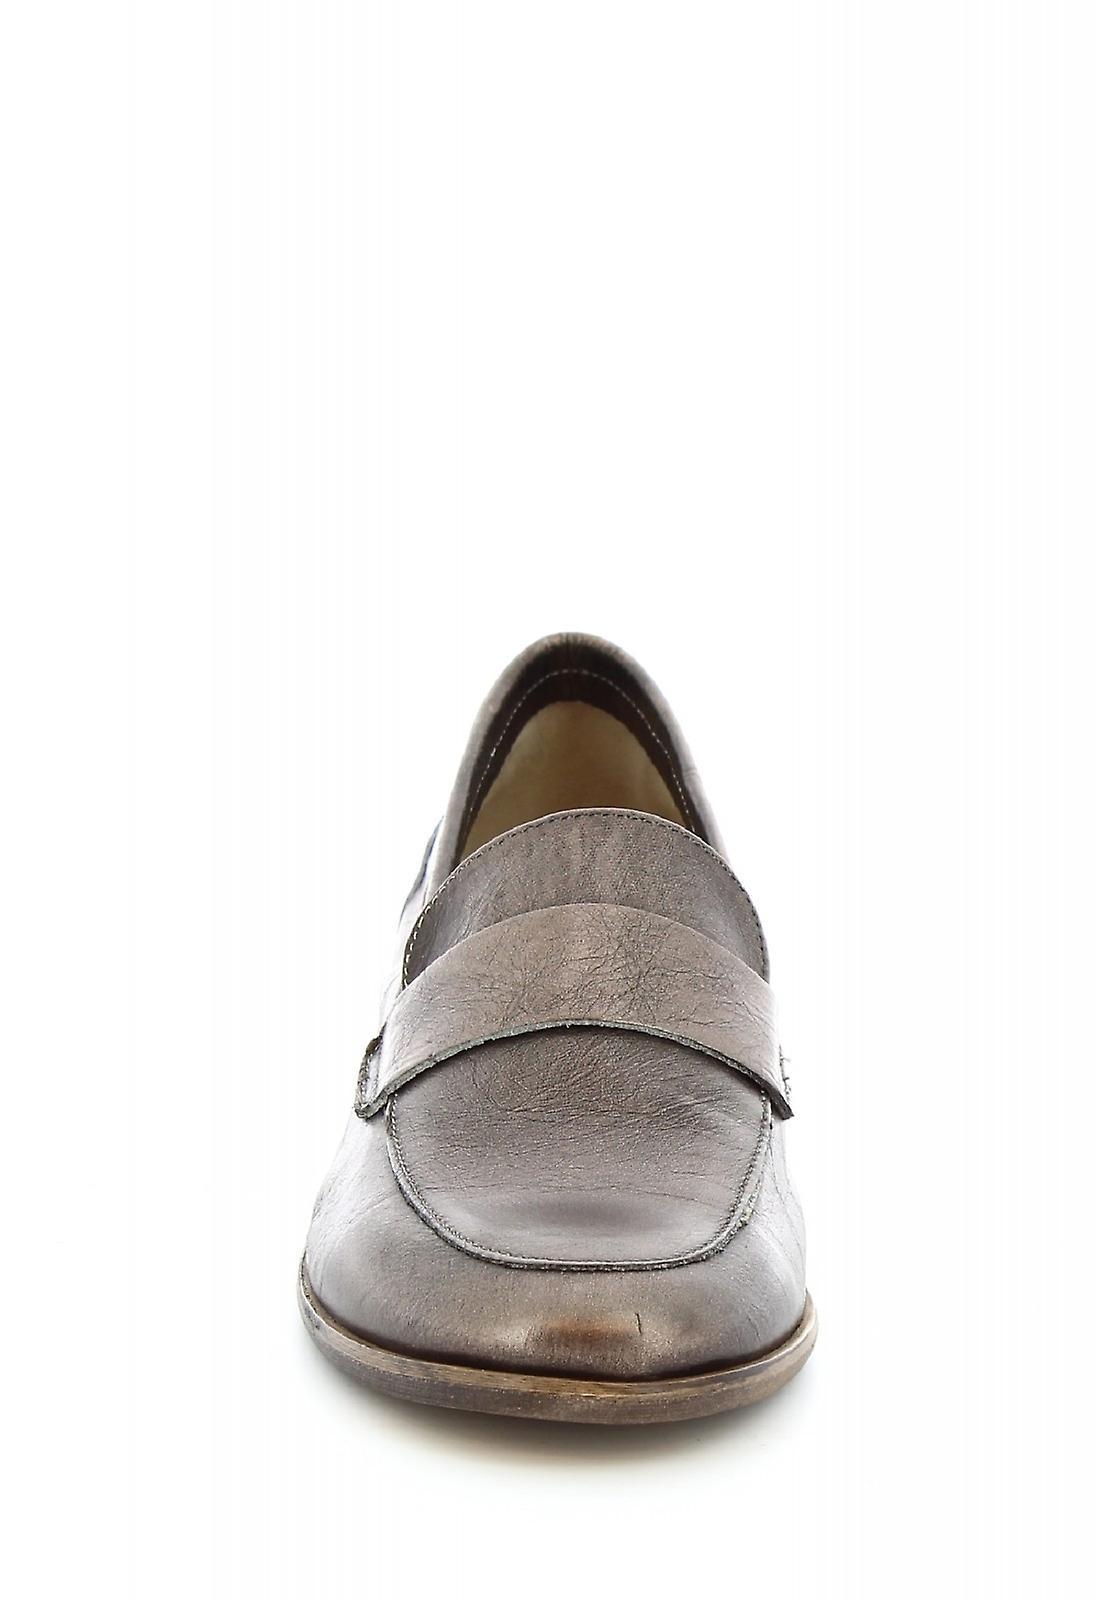 Mocassins à la main de Leonardo chaussures en cuir de veau ambre platine